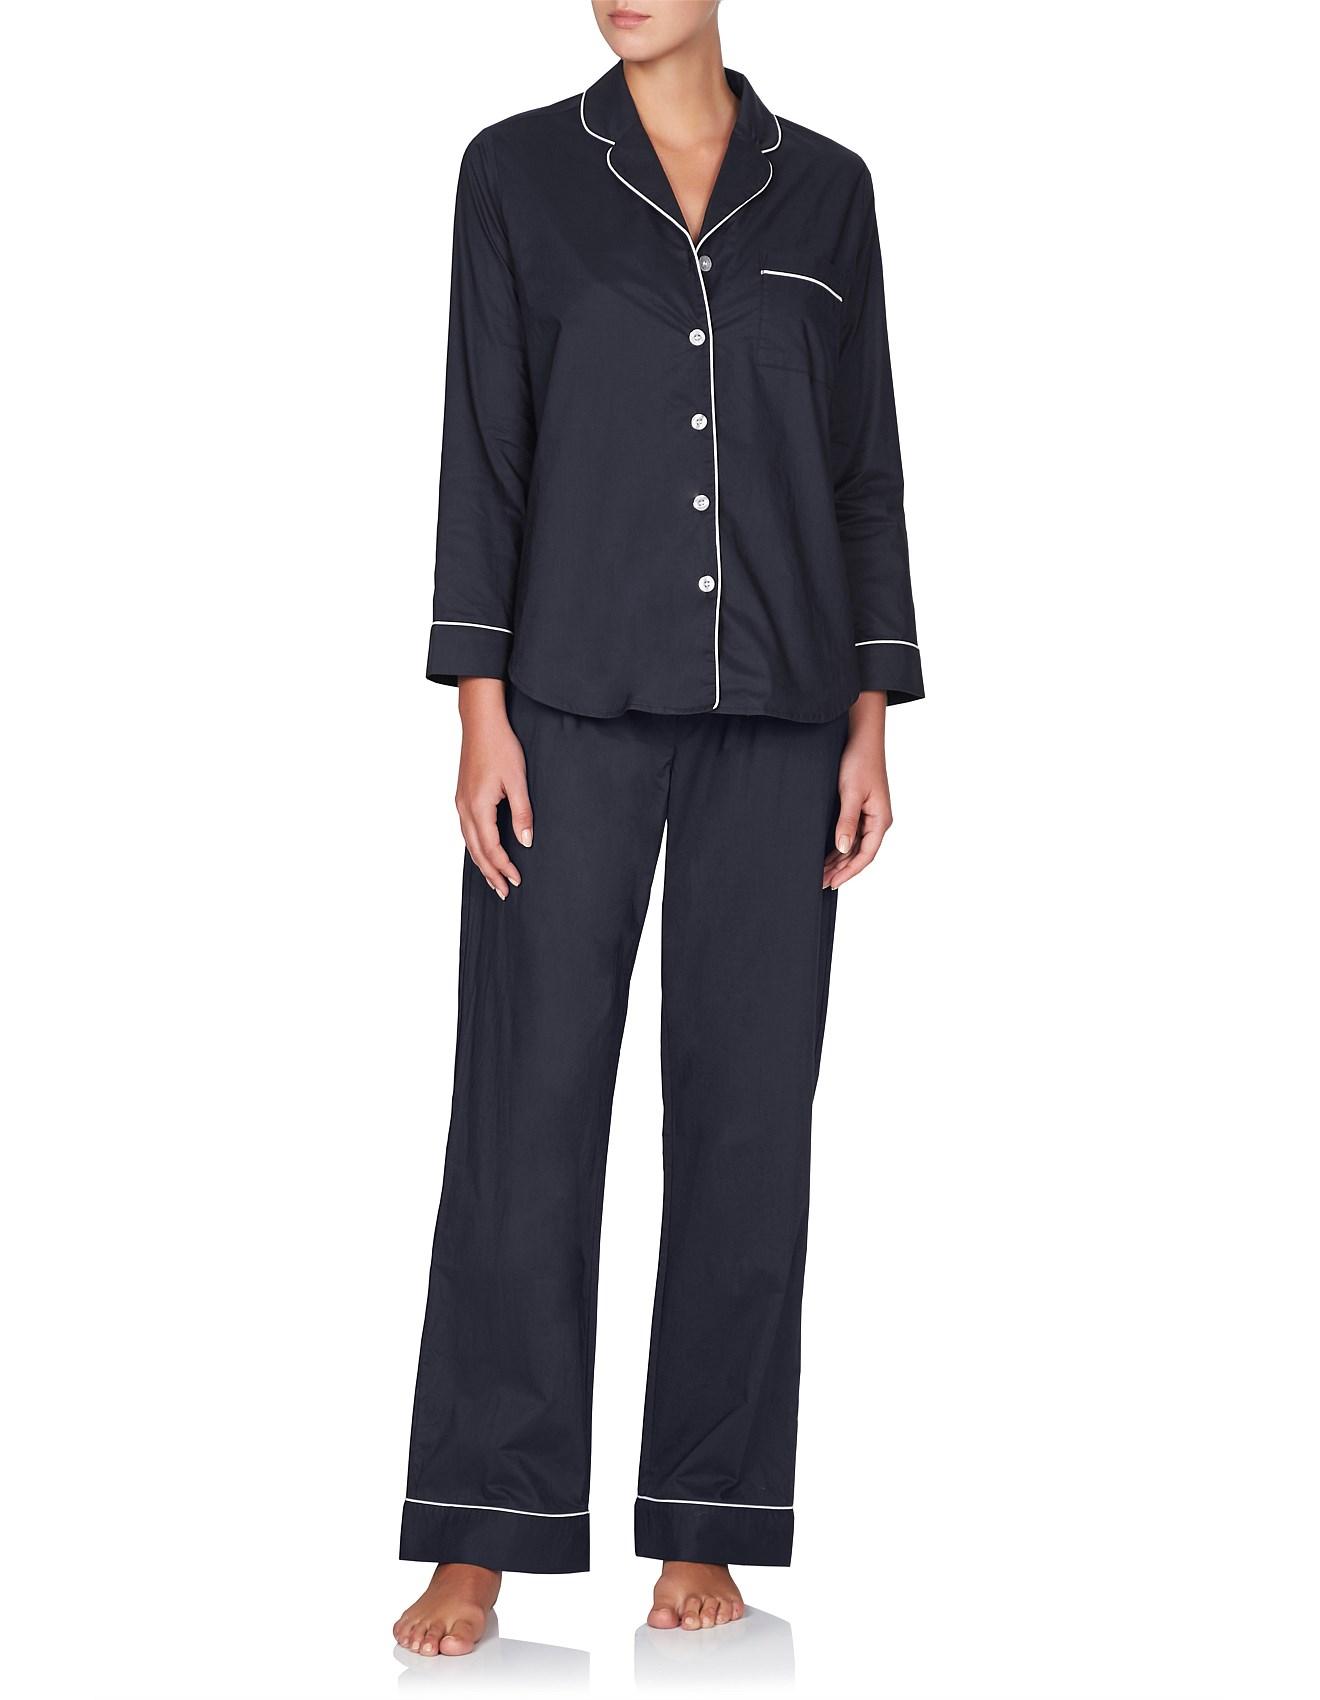 Good Sleep Guide - Long Sleeve Cotton PJ Set With Contrast Piping b54edac31